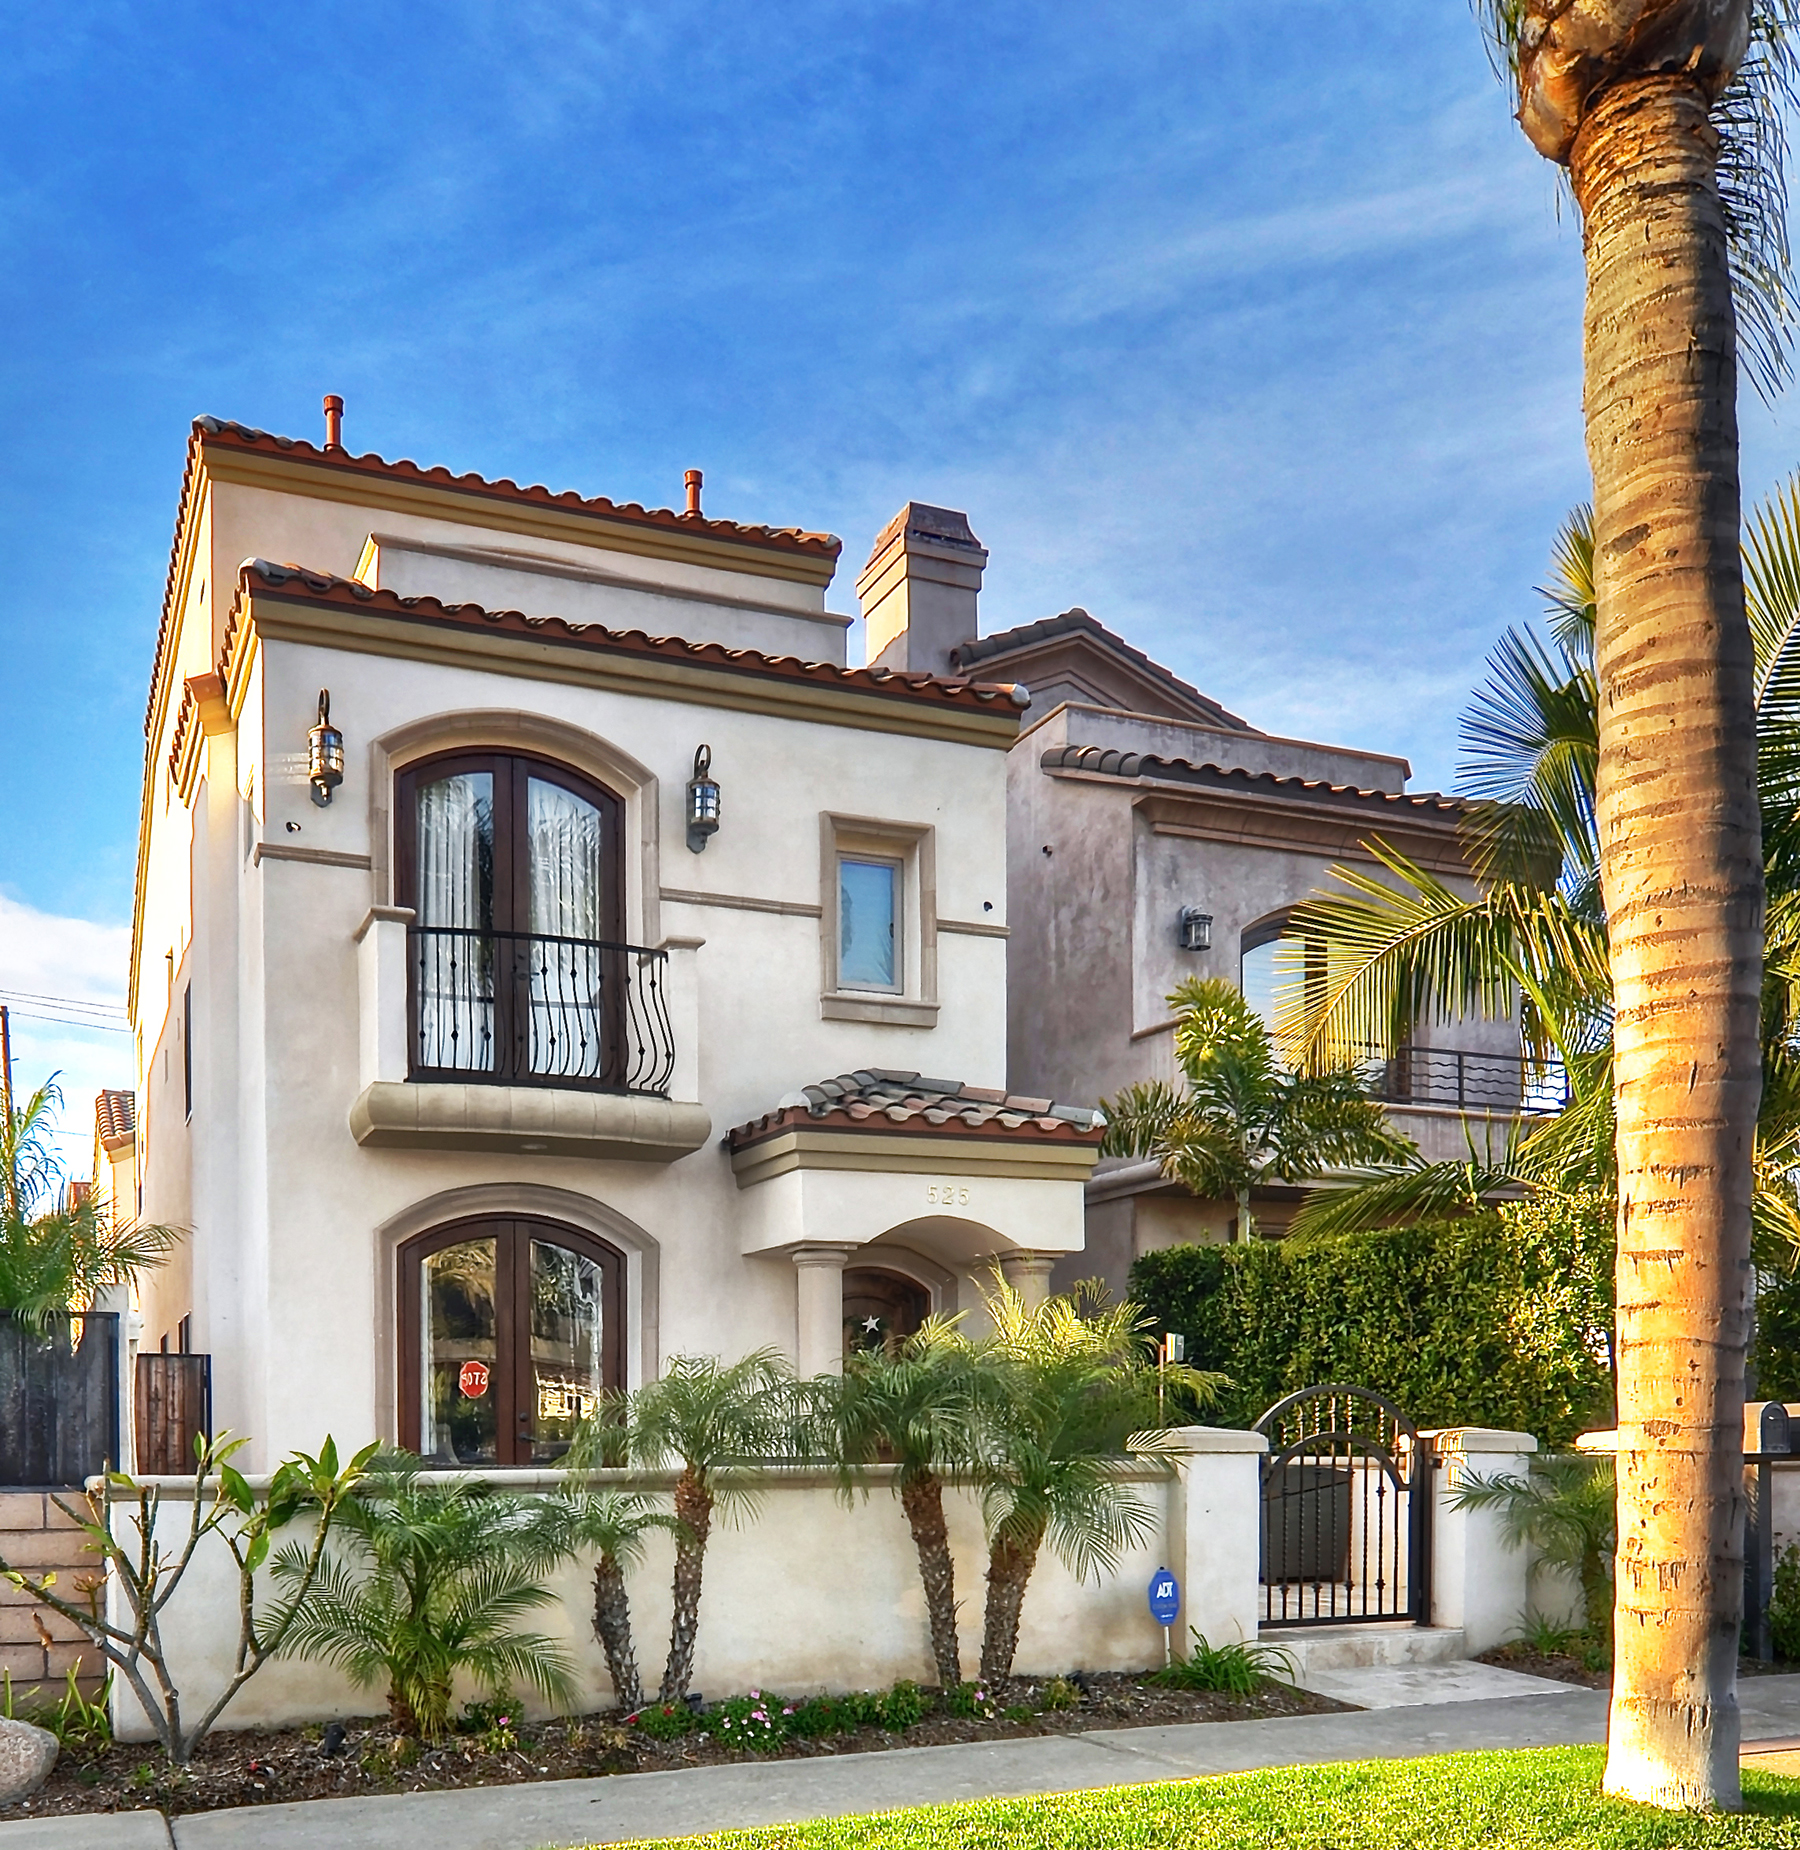 Single Family Home for Sale at 525 15th Street Huntington Beach, California 92648 United States